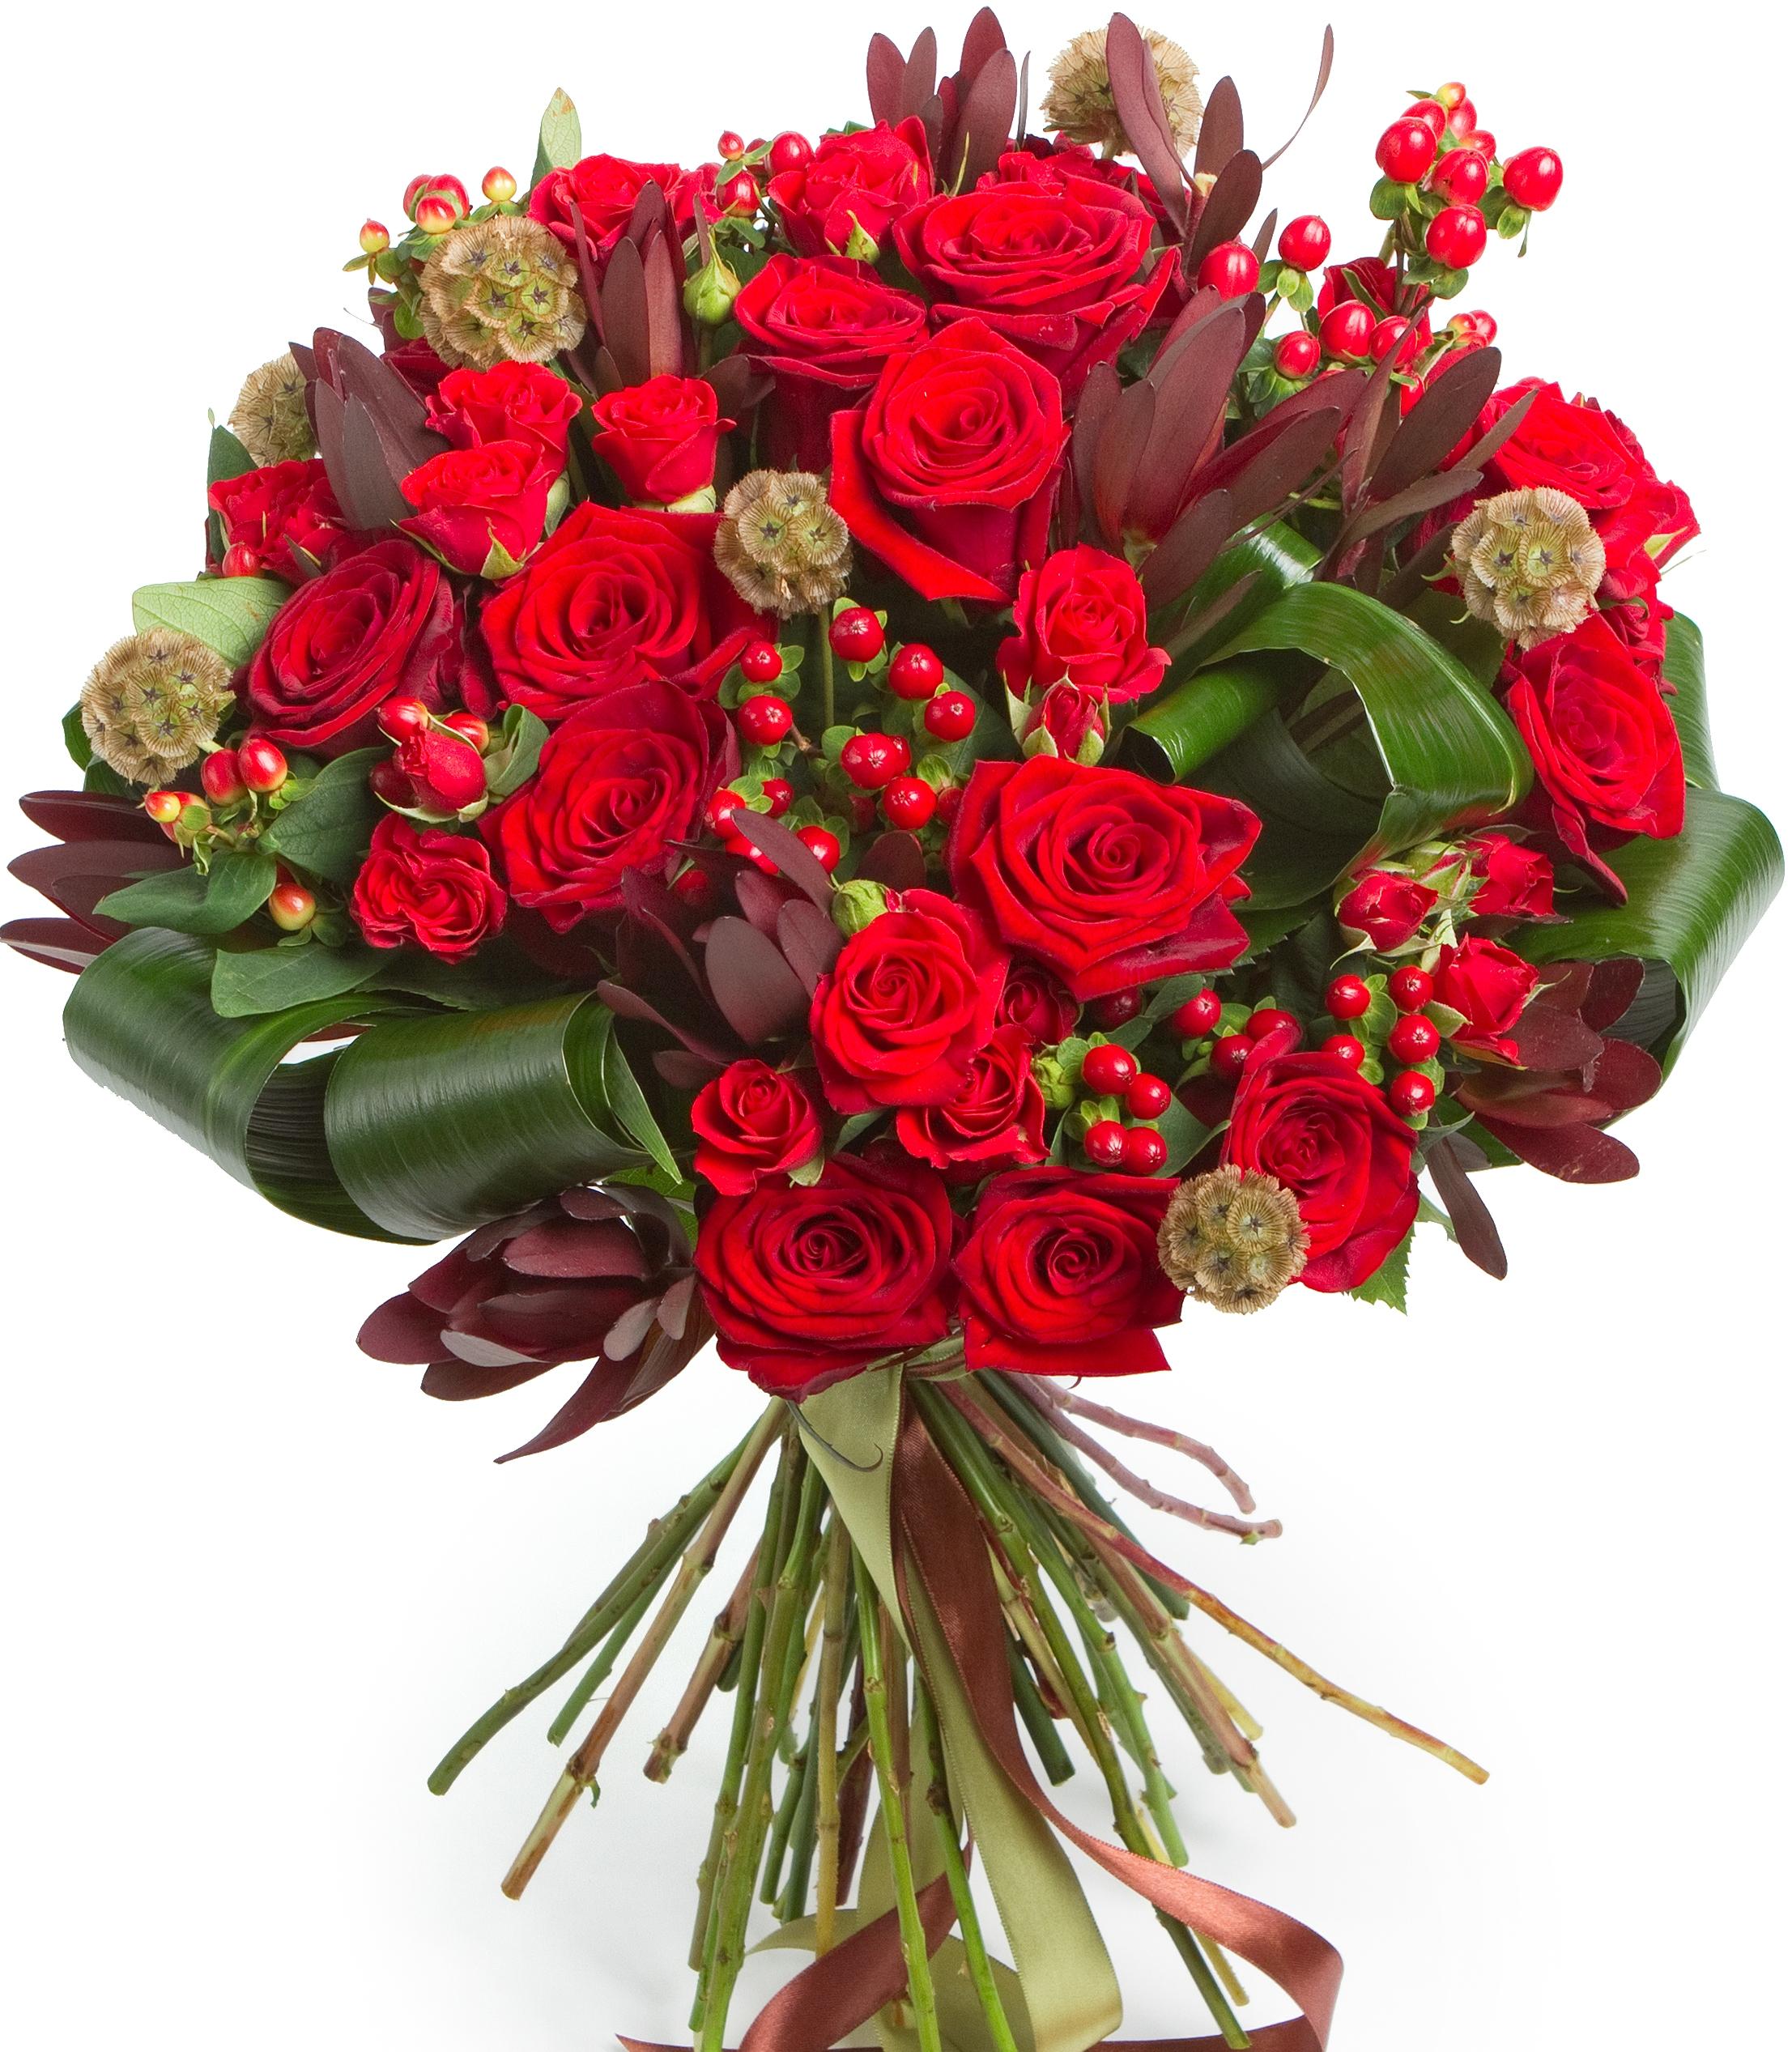 Кармен<br>Ингредиенты: Роза (60 см) 15 шт, Аспидистра 5 шт, Скабиоза 7 шт, Леукадендрон 3 шт, Гиперикум 5 шт, Роза кустовая 10 шт;